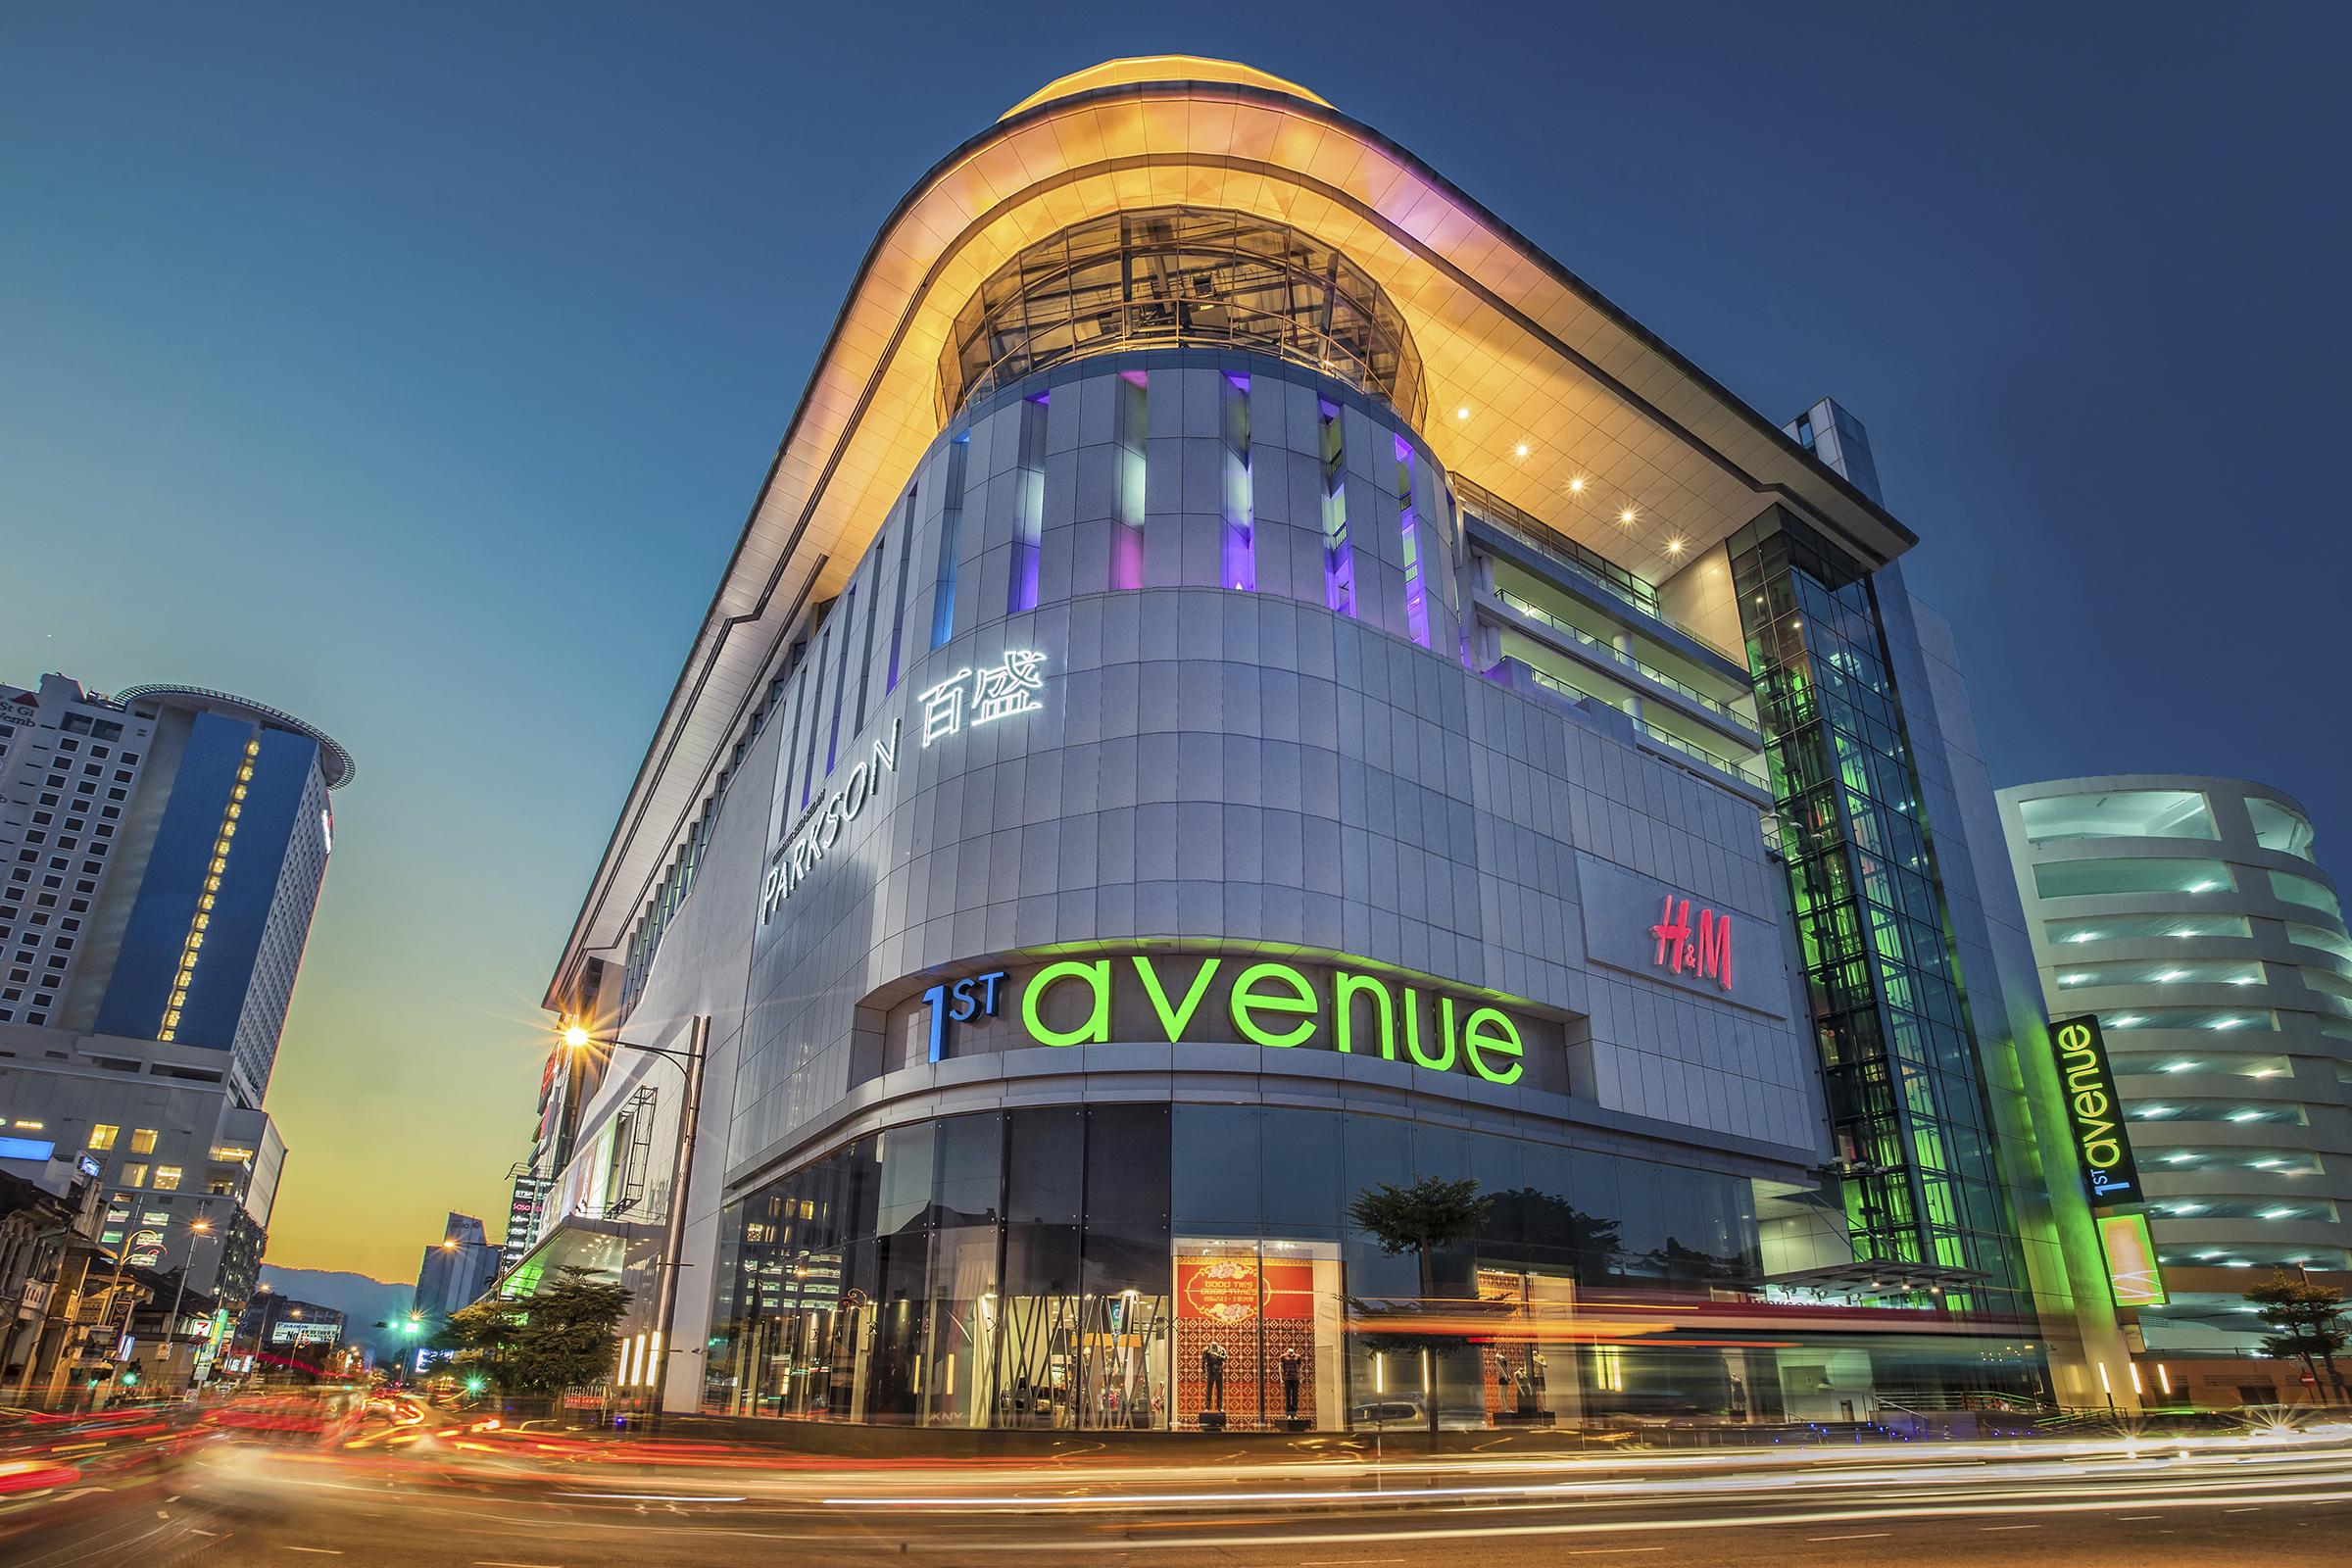 833cab550645a0 1st Avenue Mall